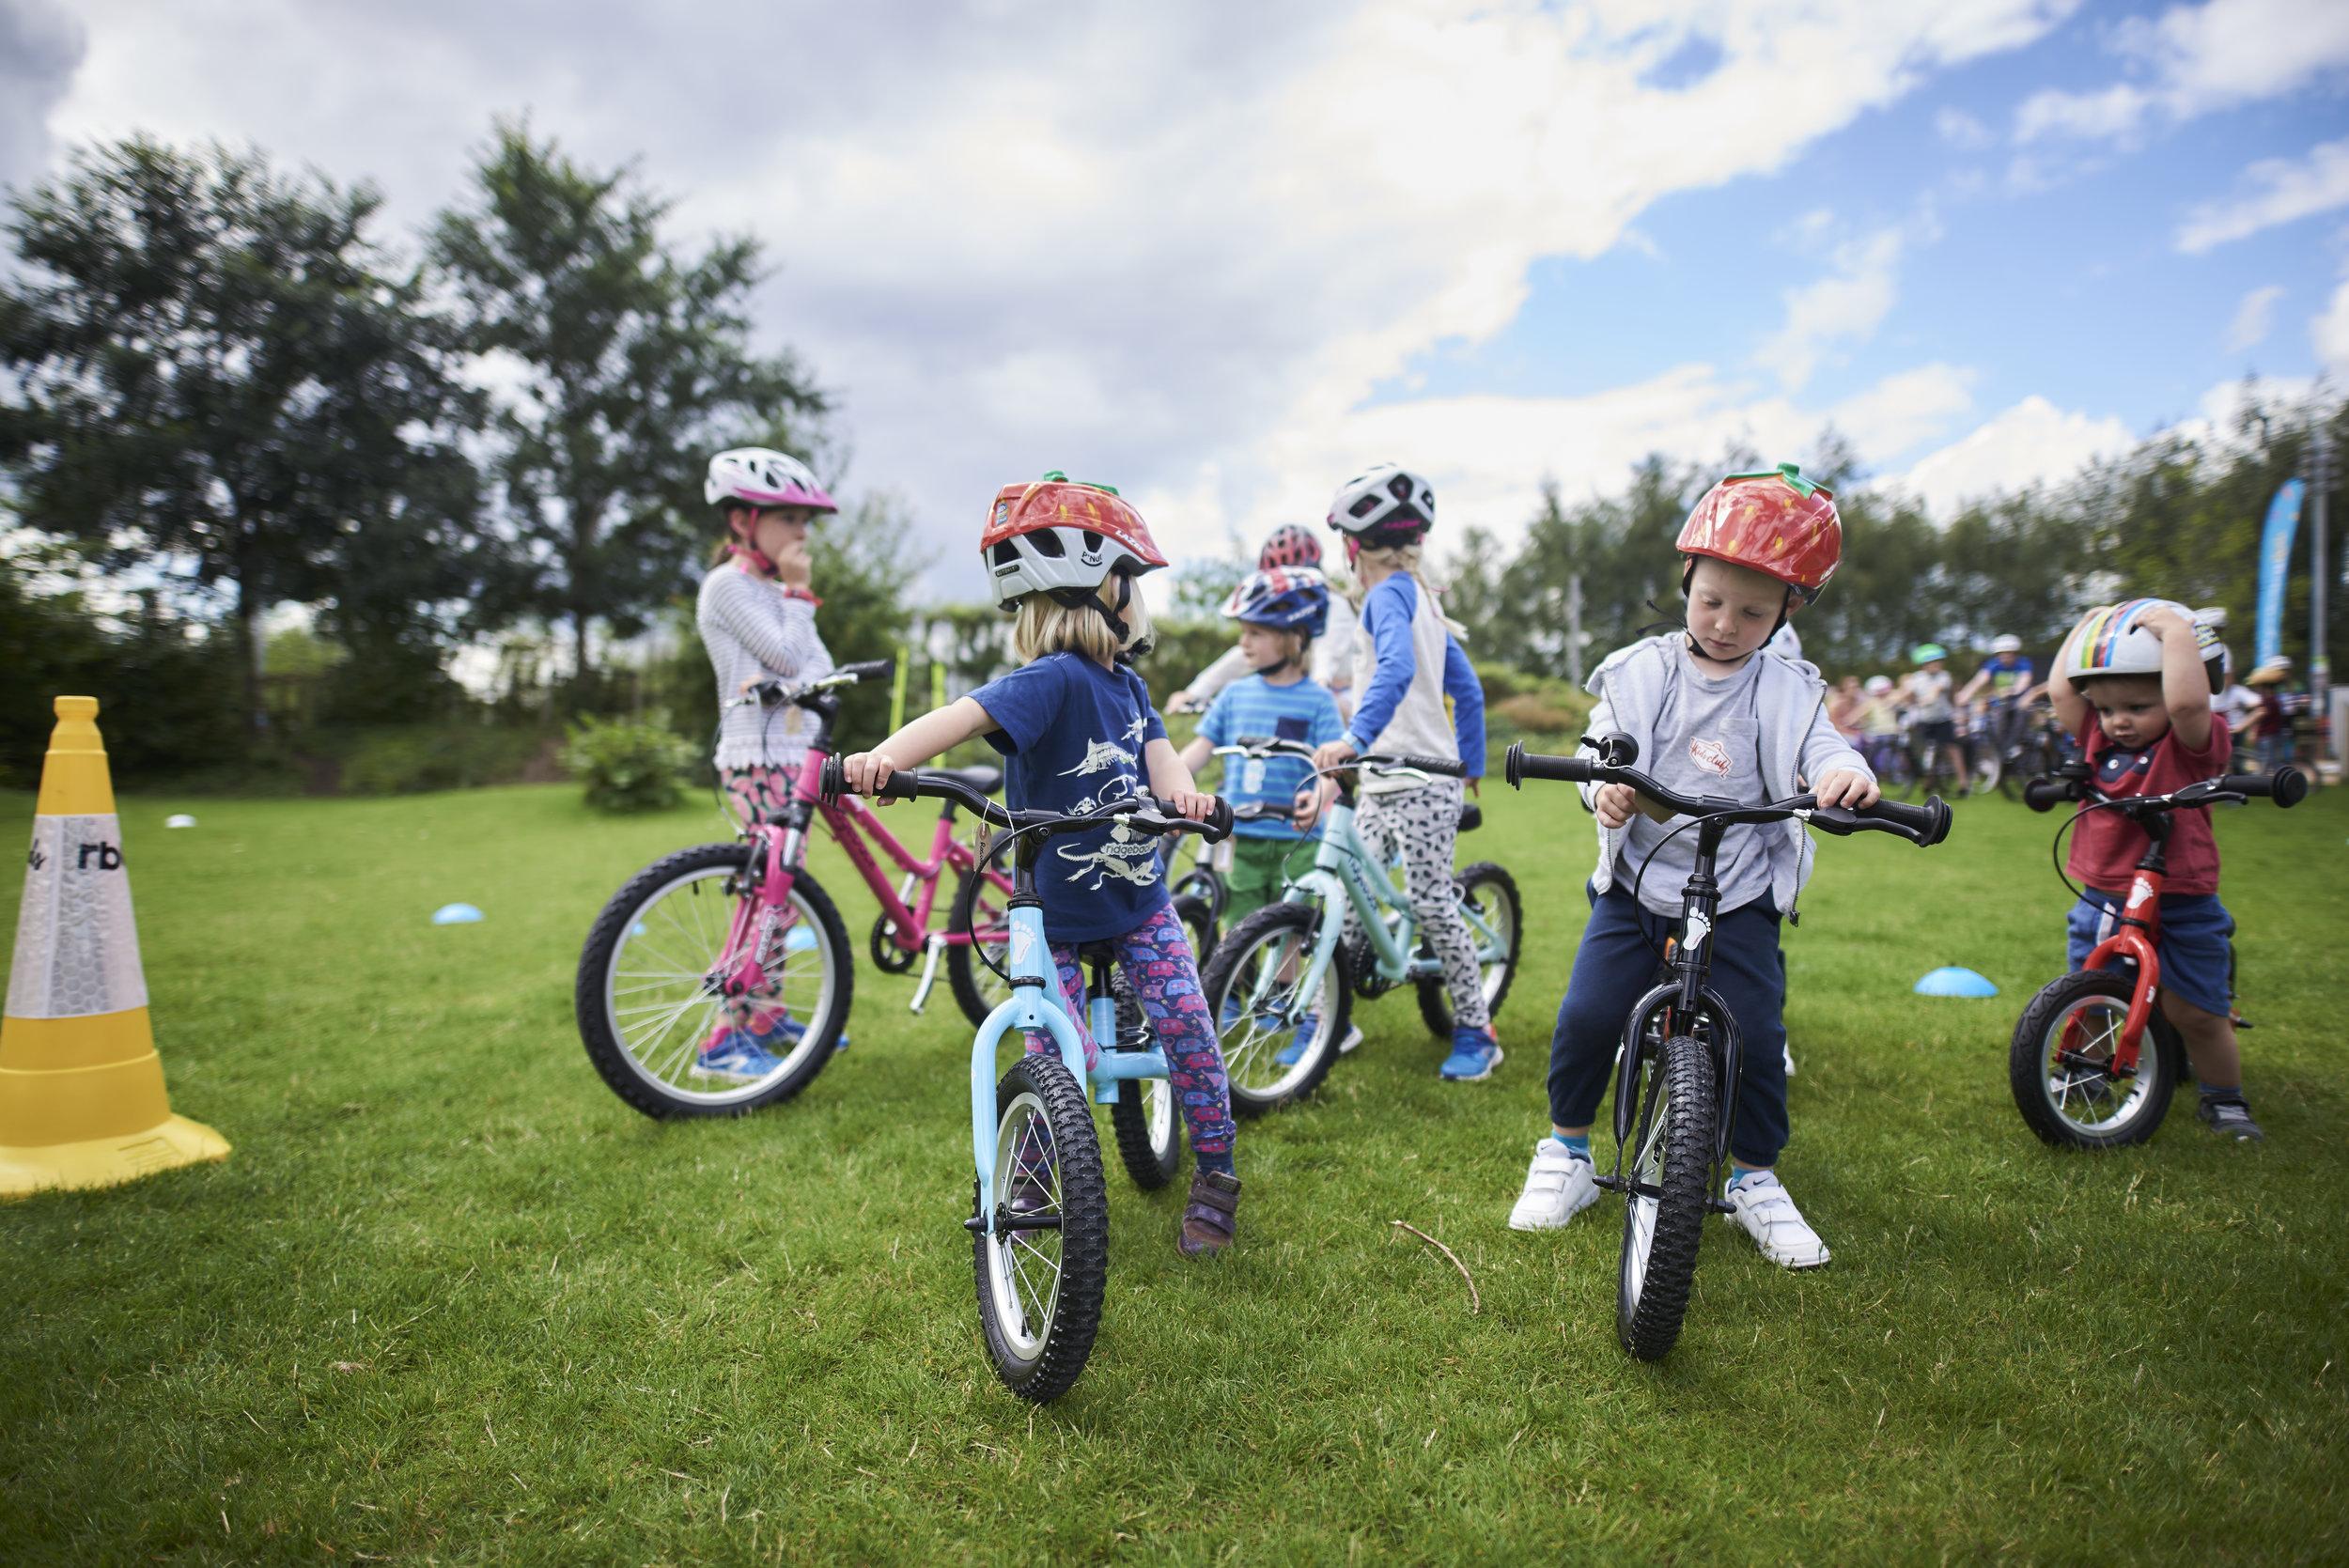 20170801-Ridgeback-kids-launch-0155.jpg